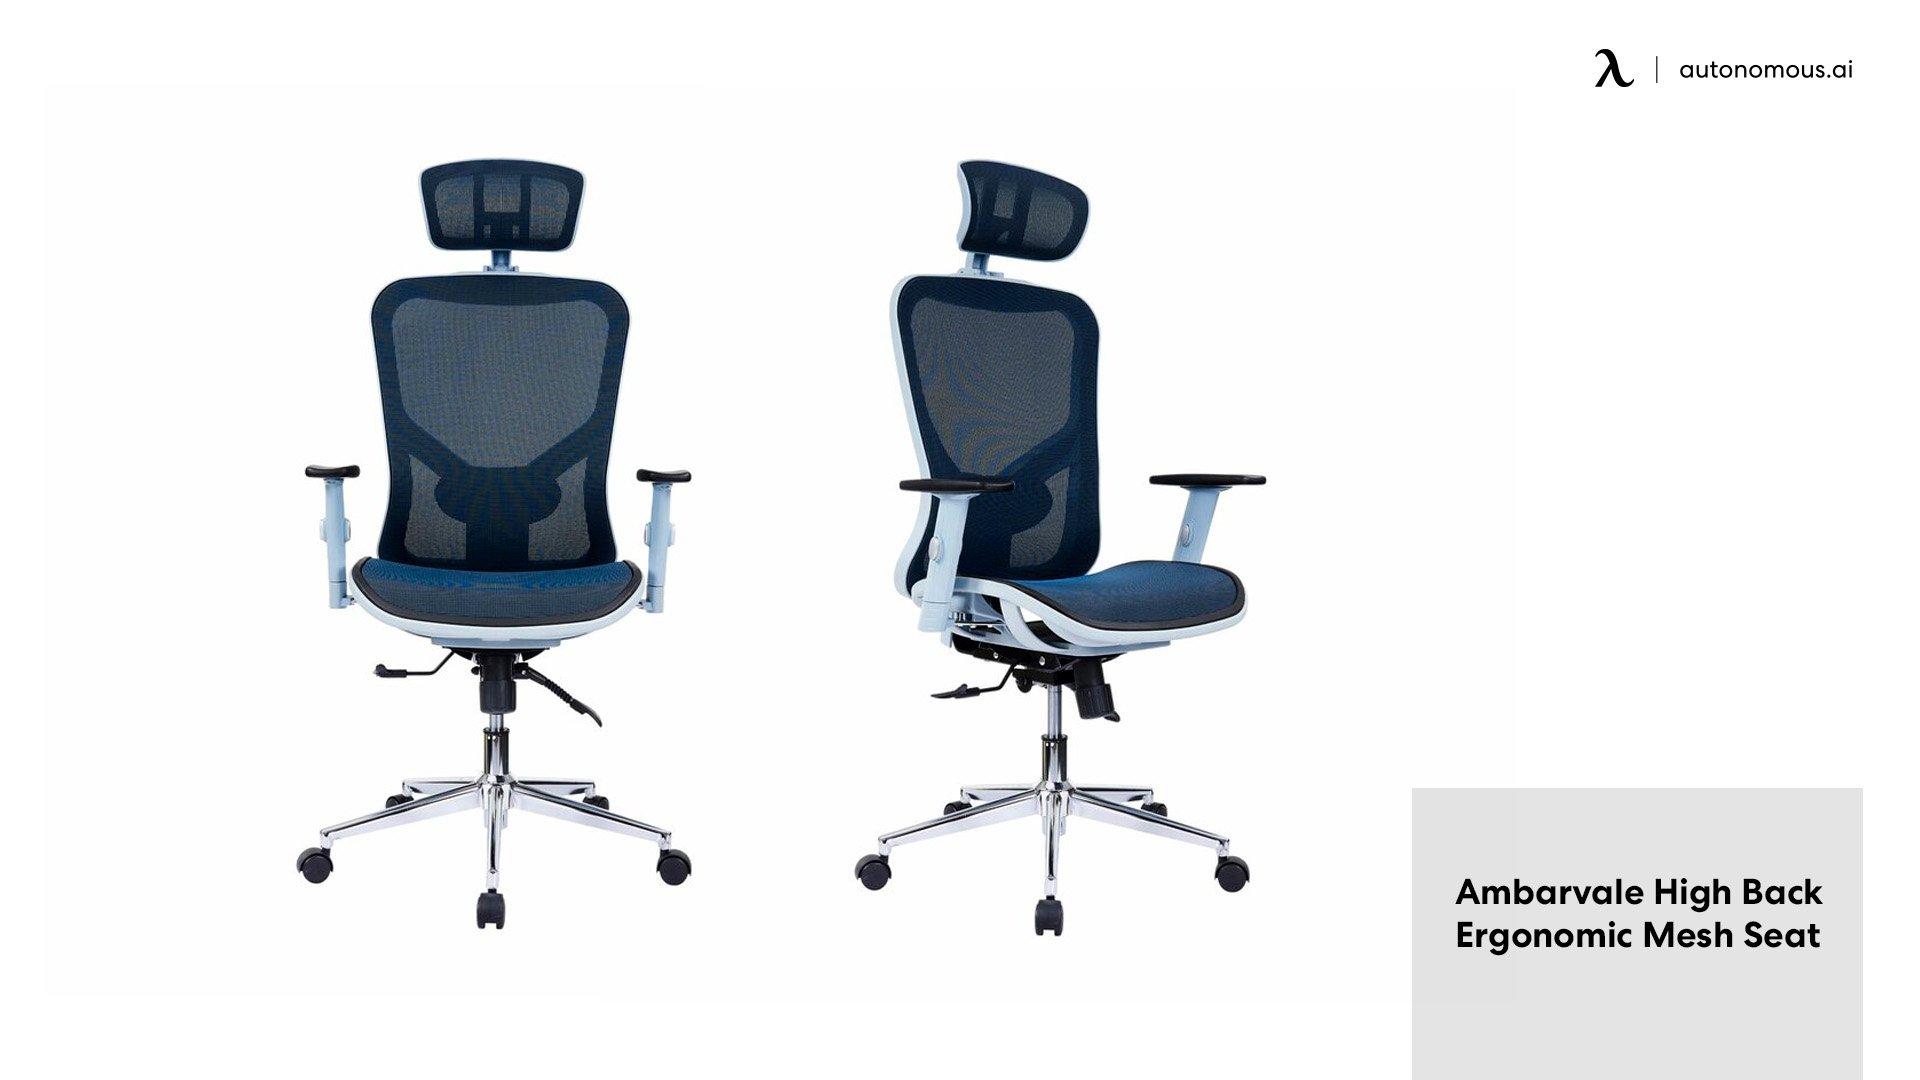 Ambarvale High Back Ergonomic Mesh Seat